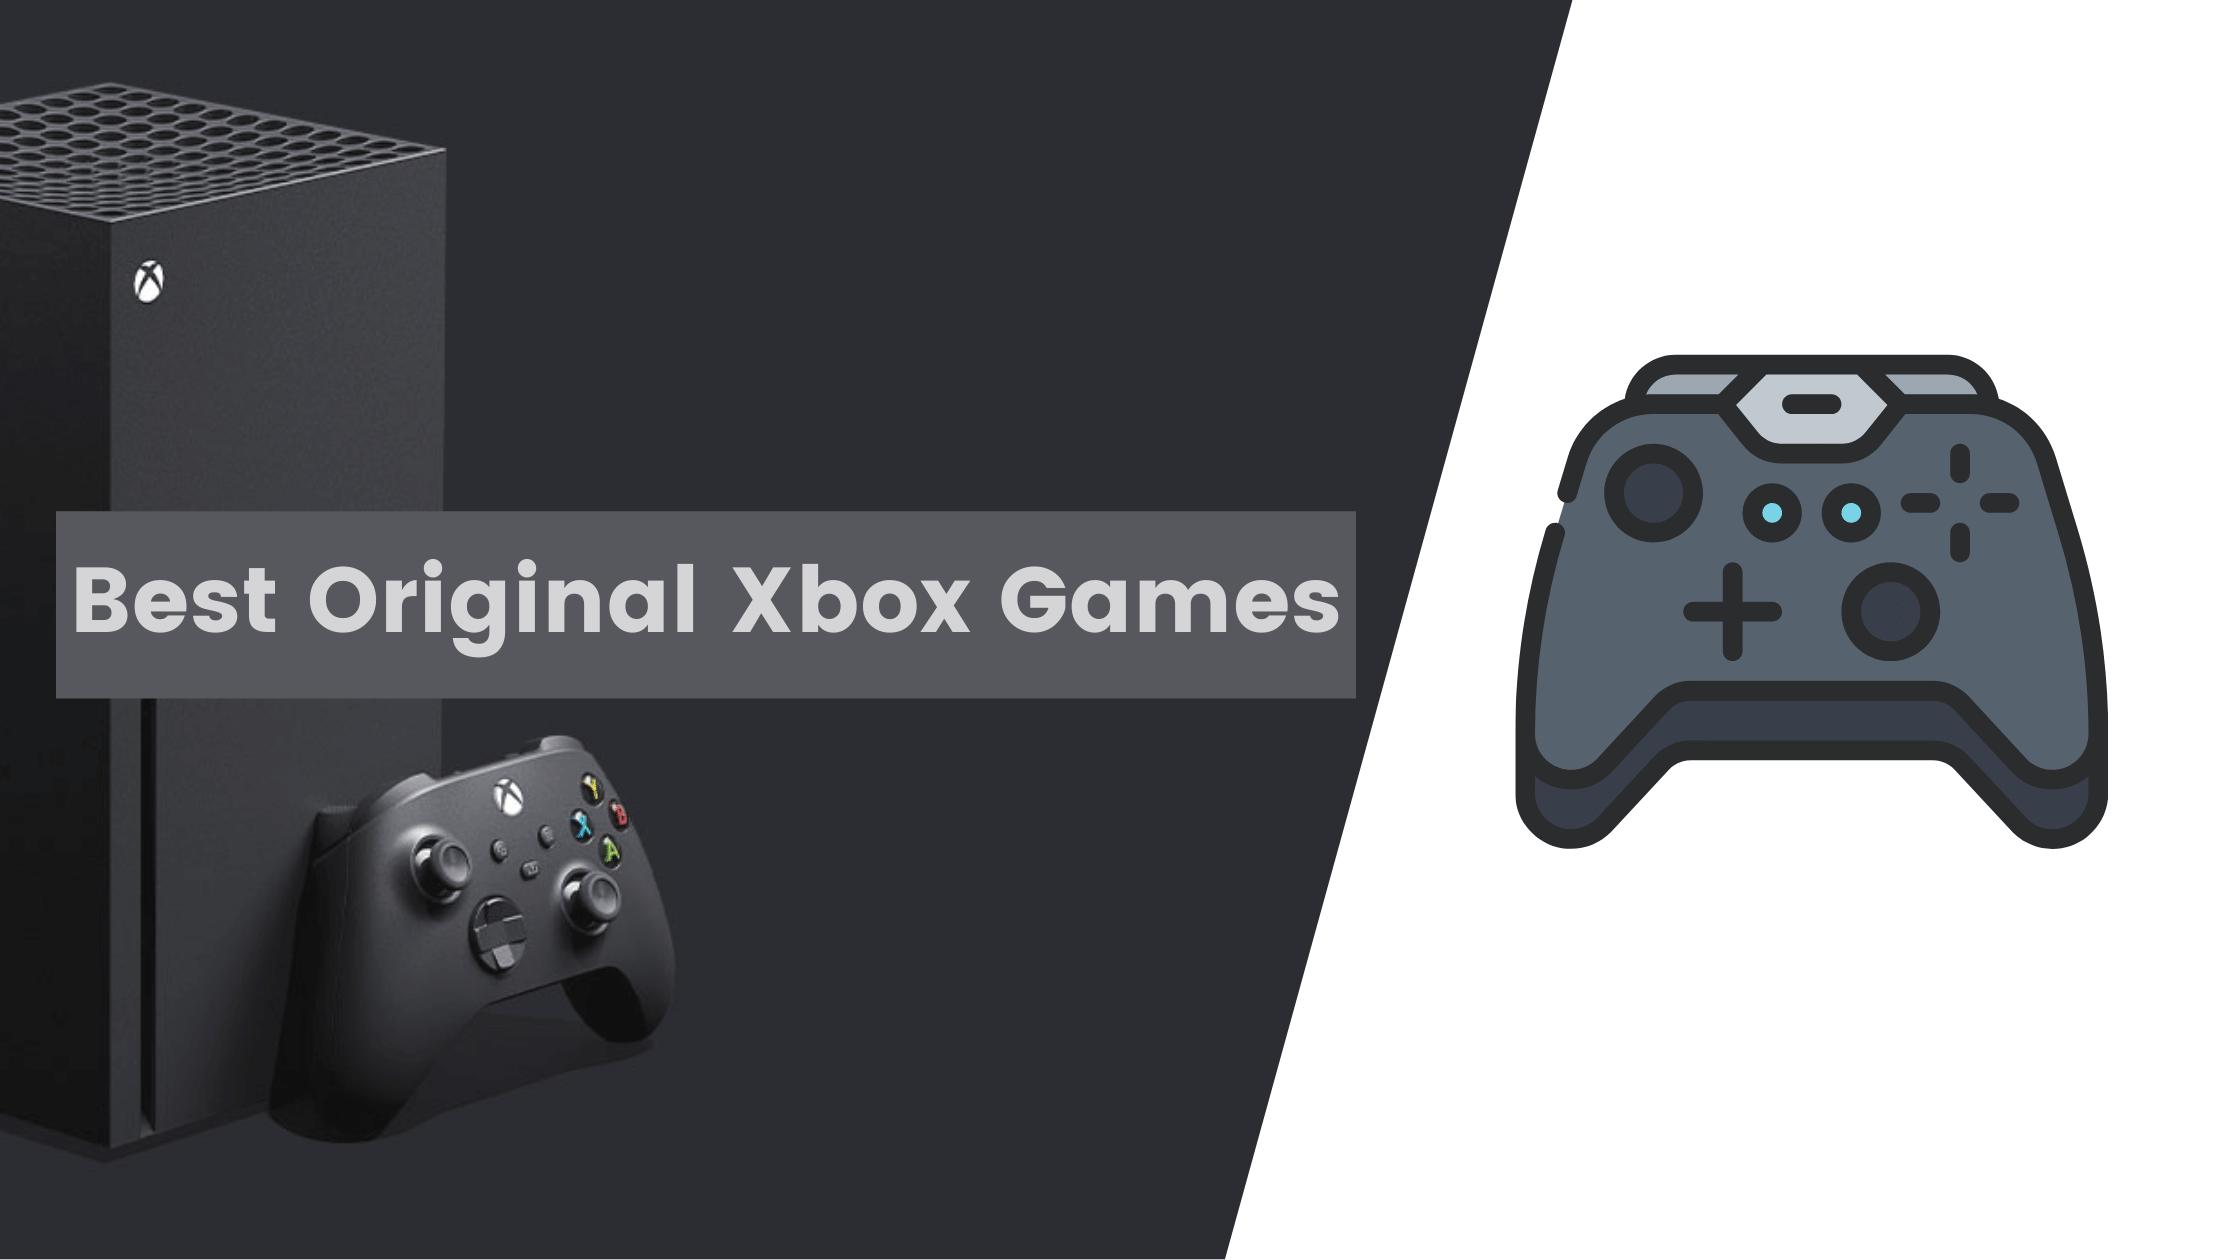 best original Xbox games, top 10 best original Xbox games